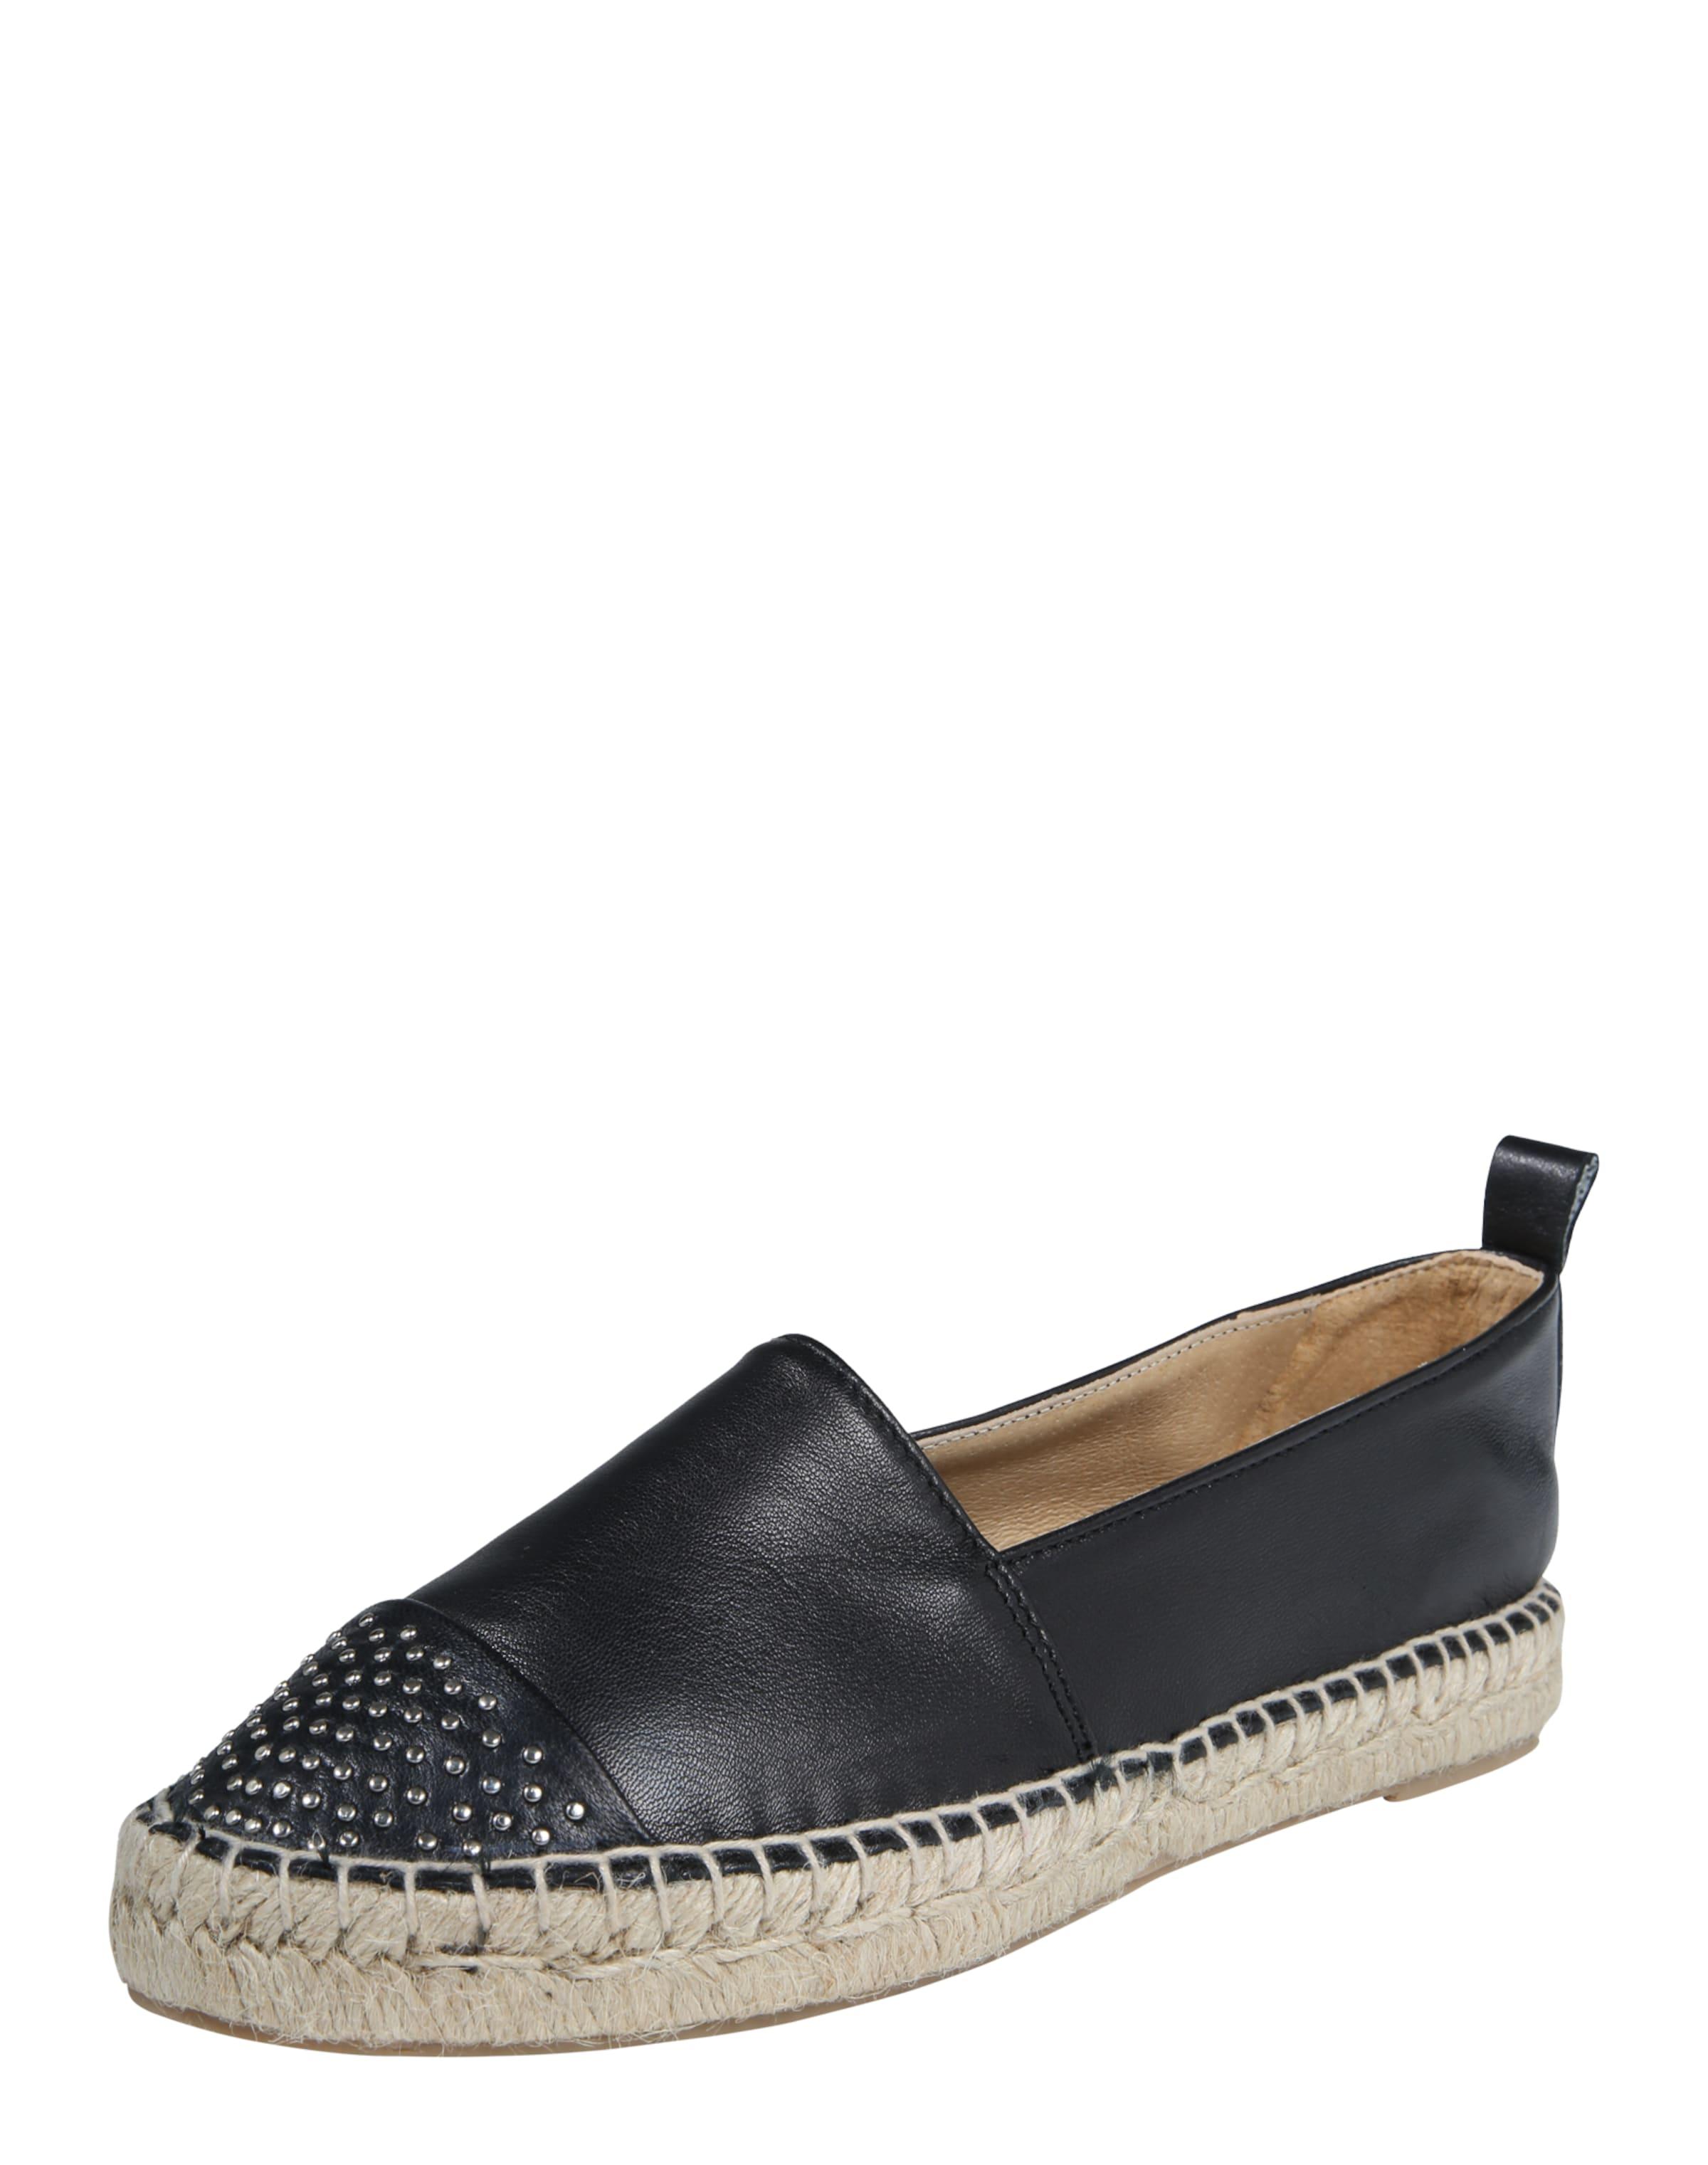 Billi Bi   Espadrille mit Nietenkappe Schuhe Gut getragene Schuhe